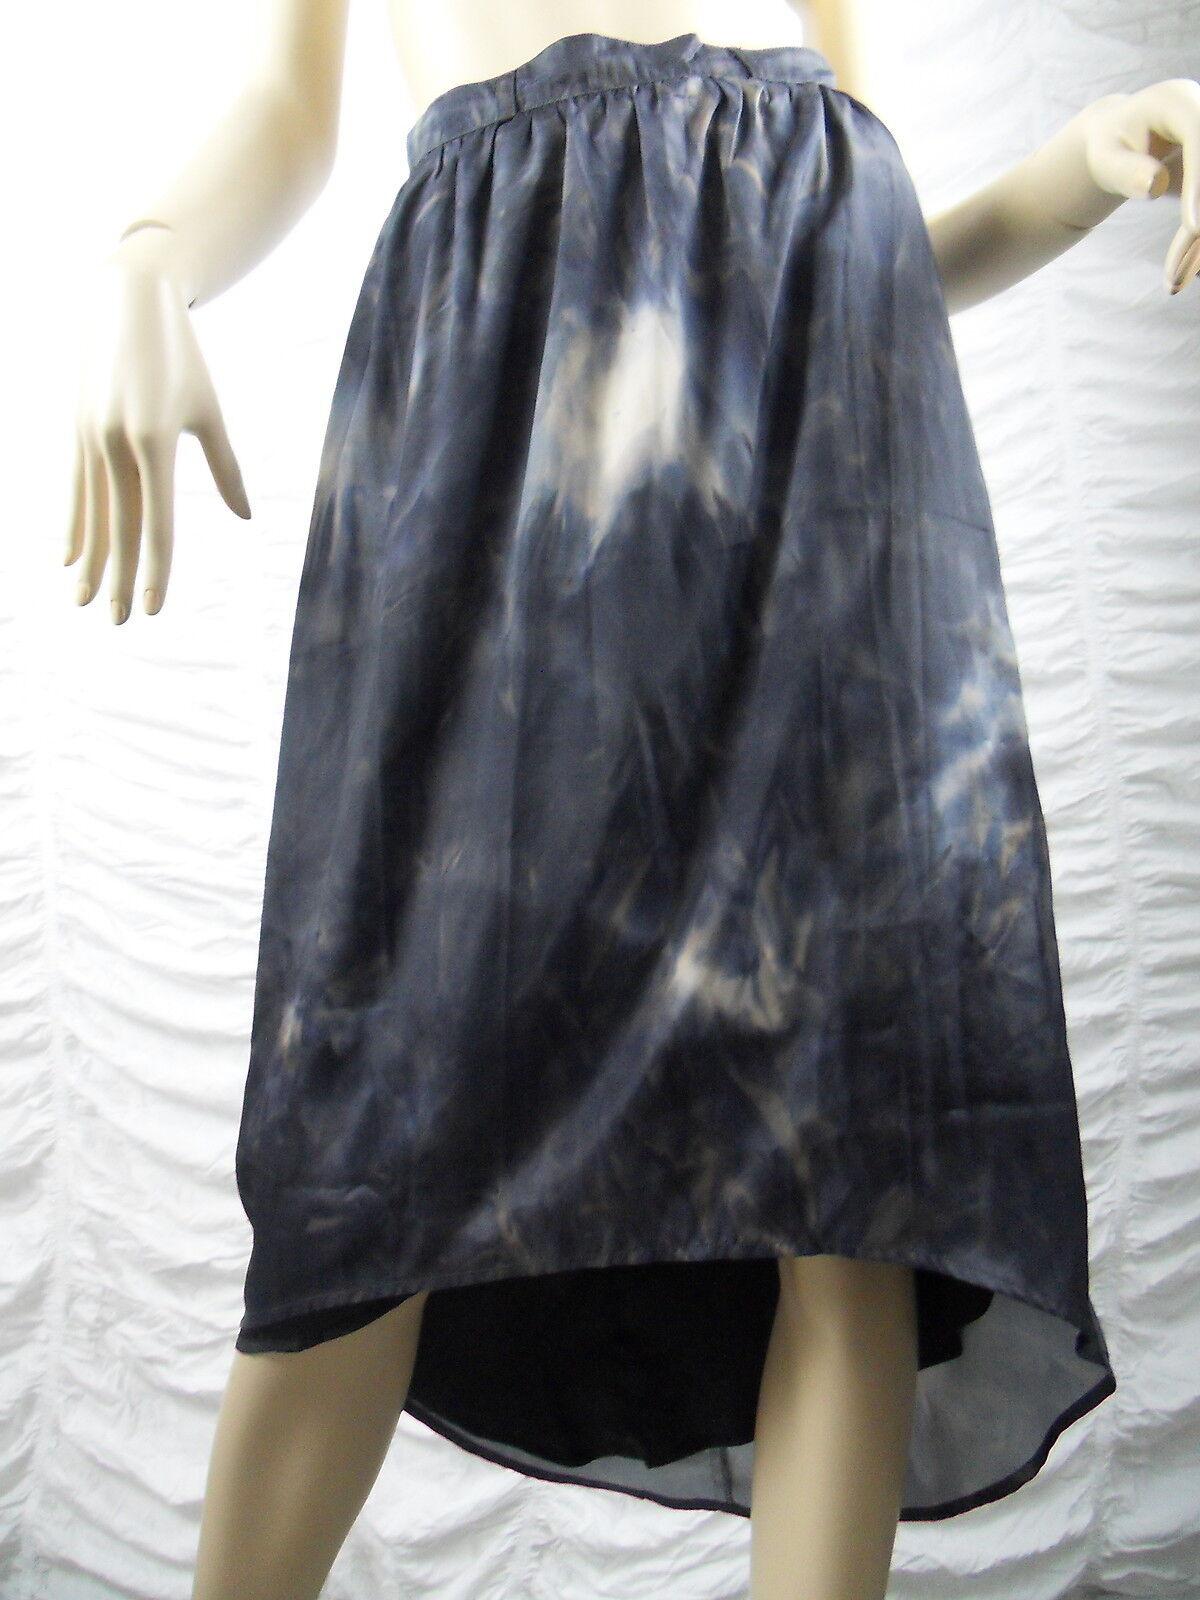 DECJUBA bluee marble print marbellous high low maxi skirt size 8 BNWT